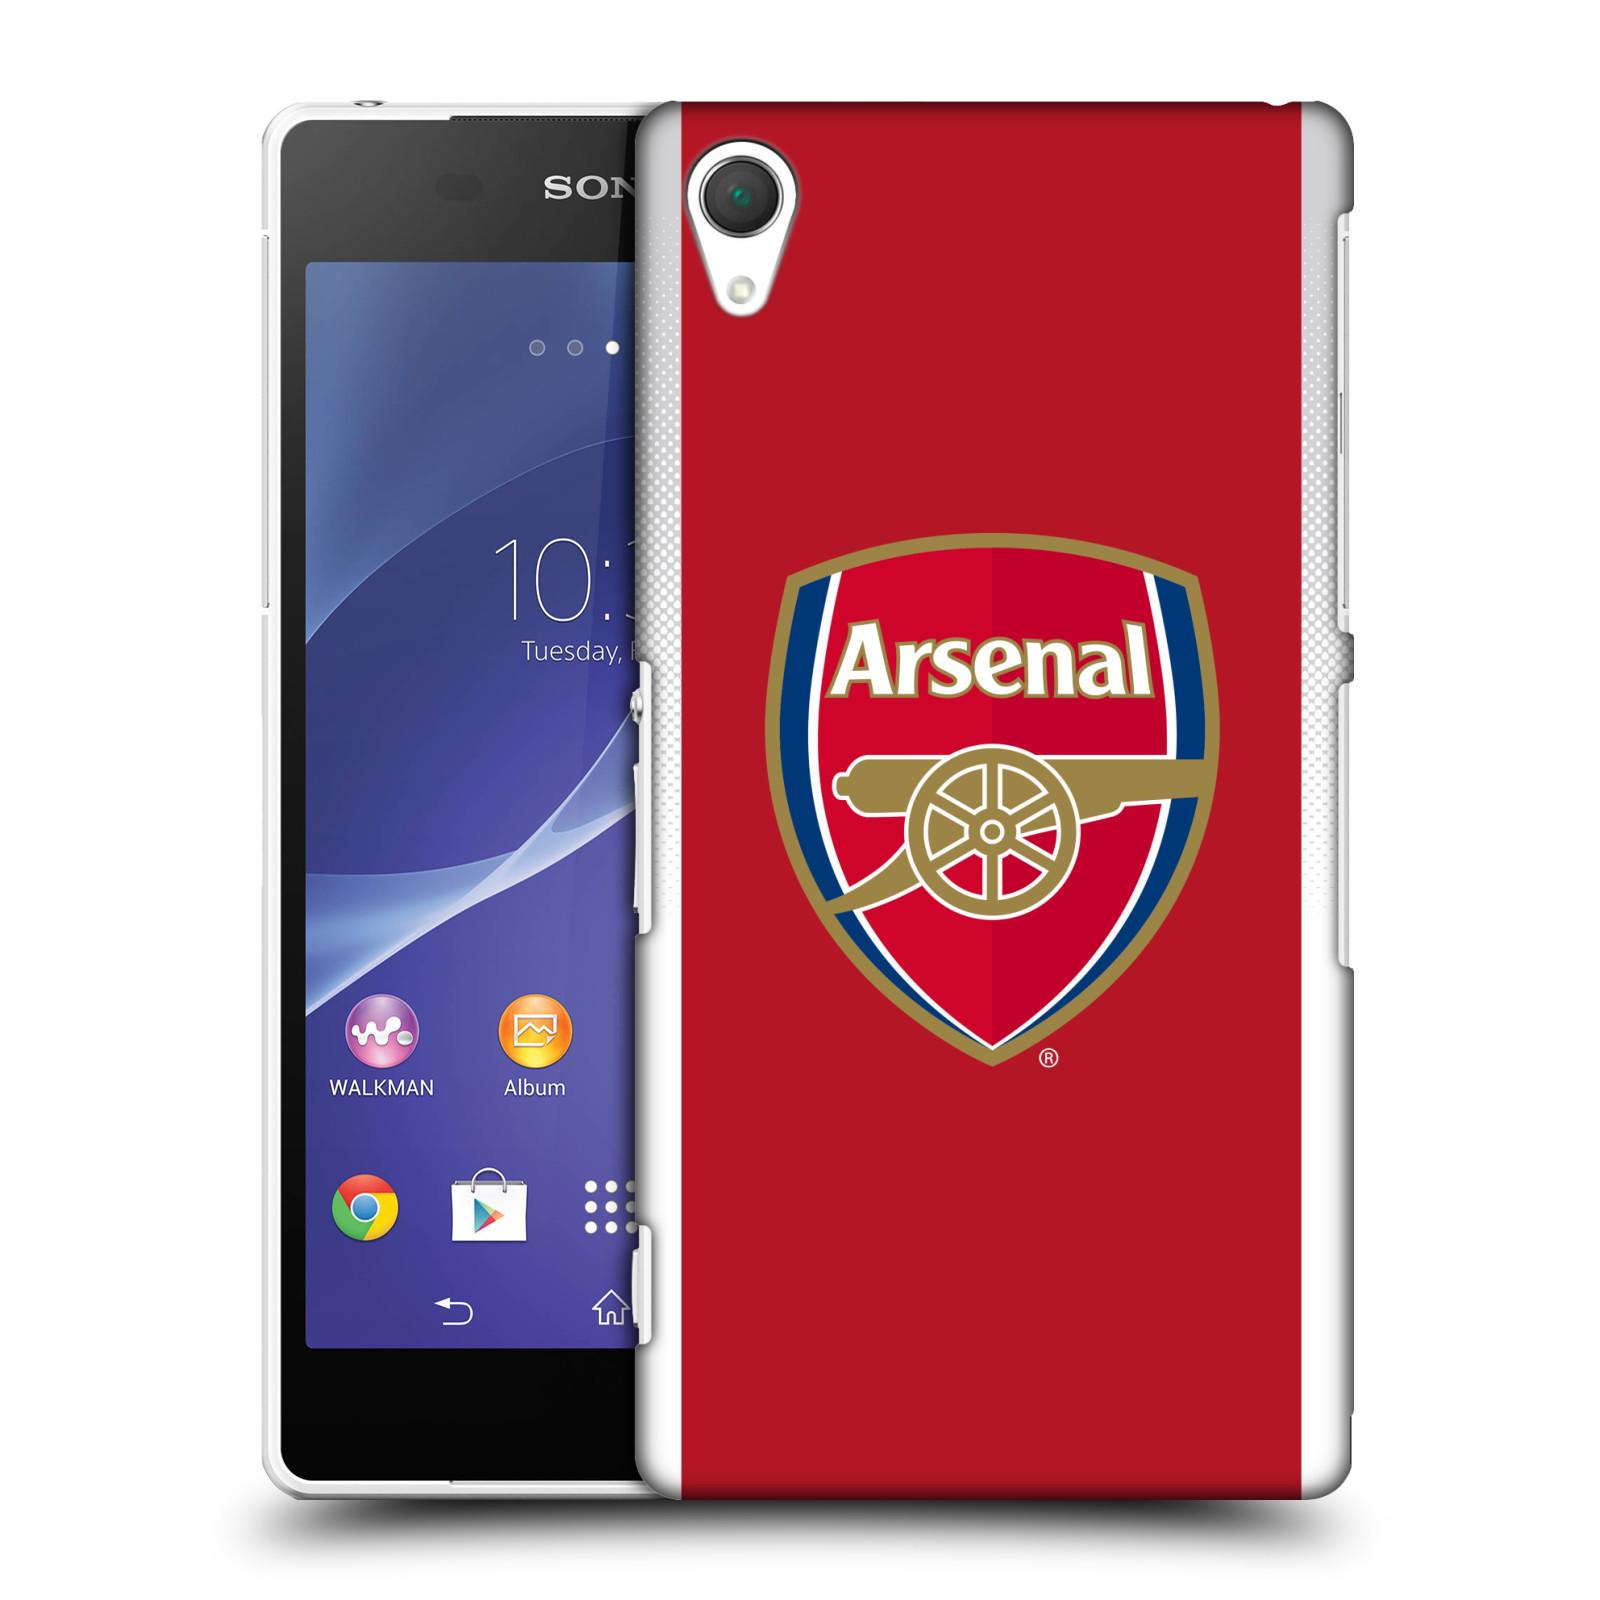 Plastové pouzdro na mobil Sony Xperia Z2 D6503 - Head Case - Arsenal FC - Logo klubu